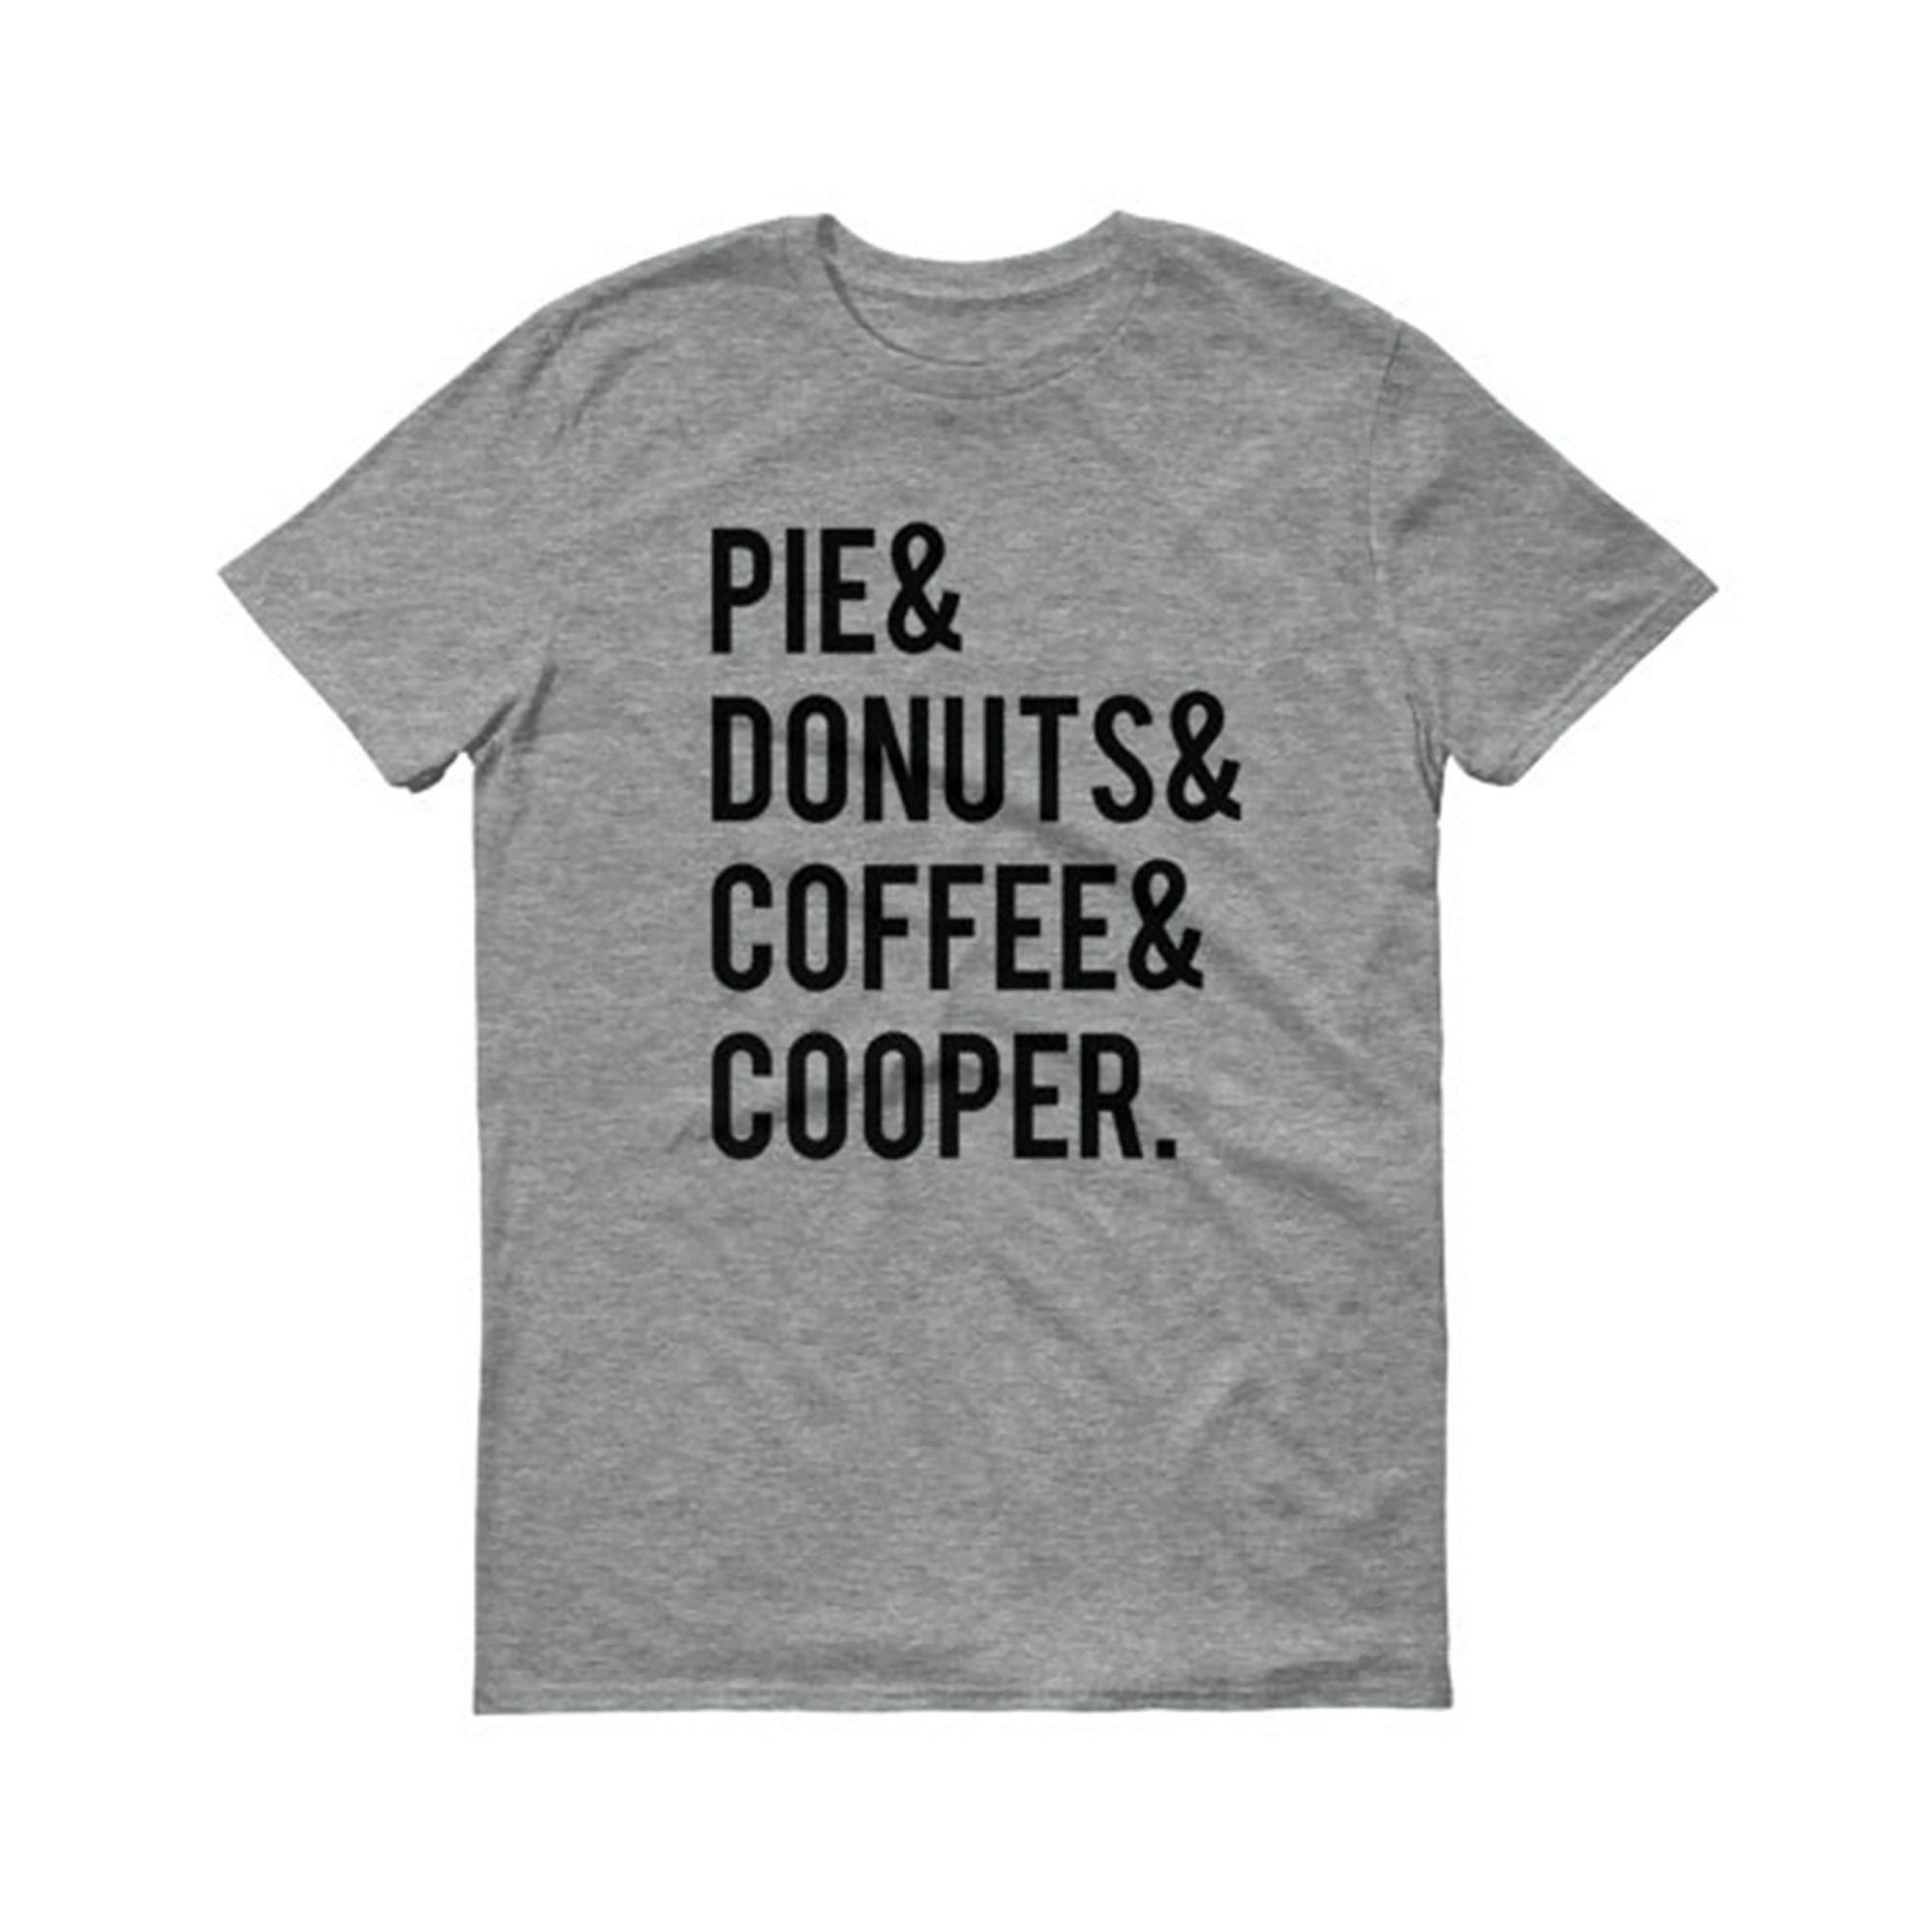 Pie-coffee-t-shirt